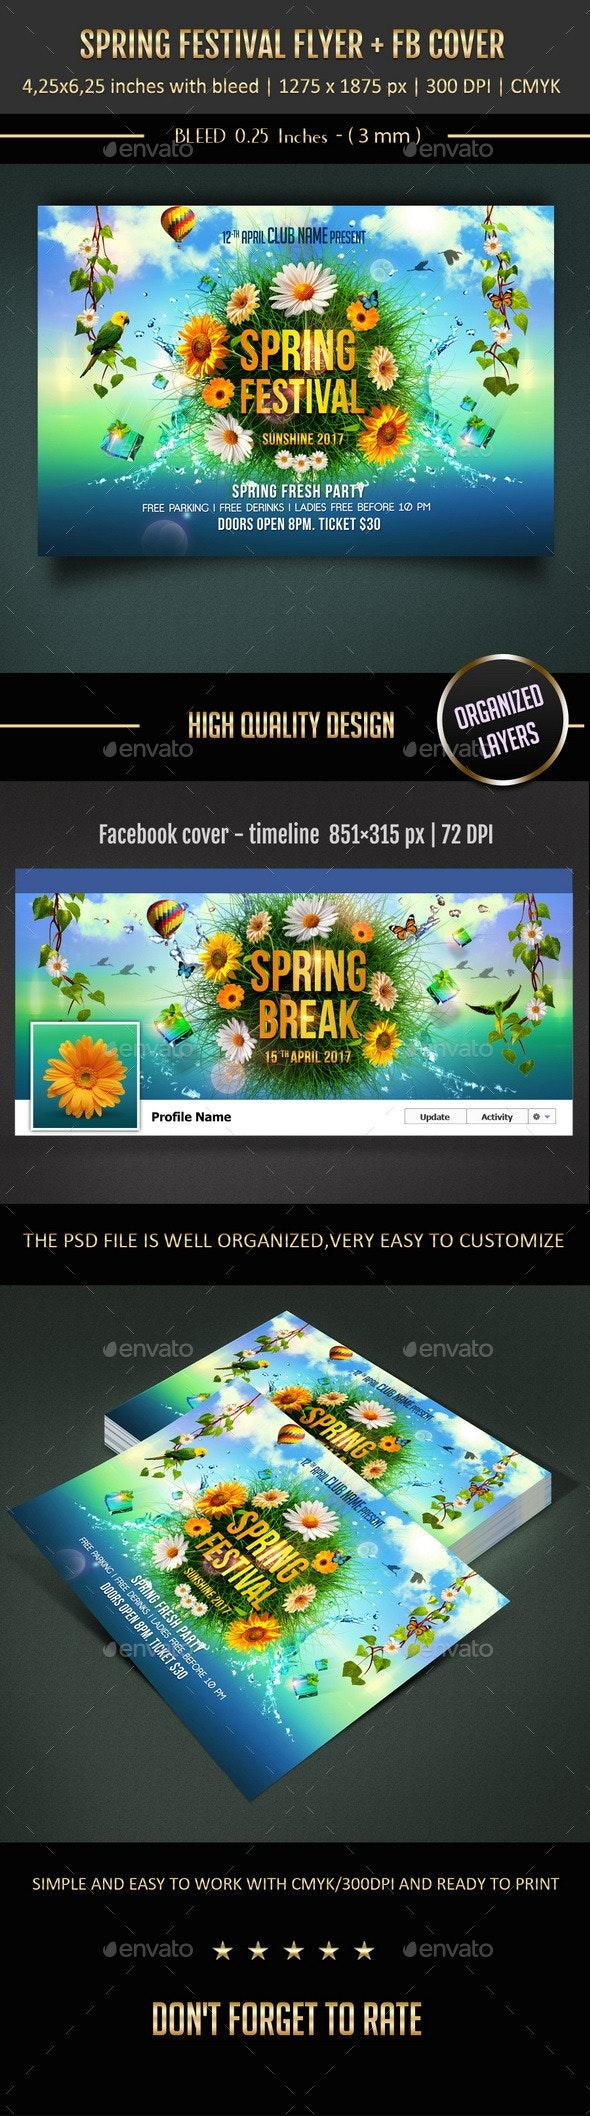 Spring Festival Flyer - Flyers Print Templates